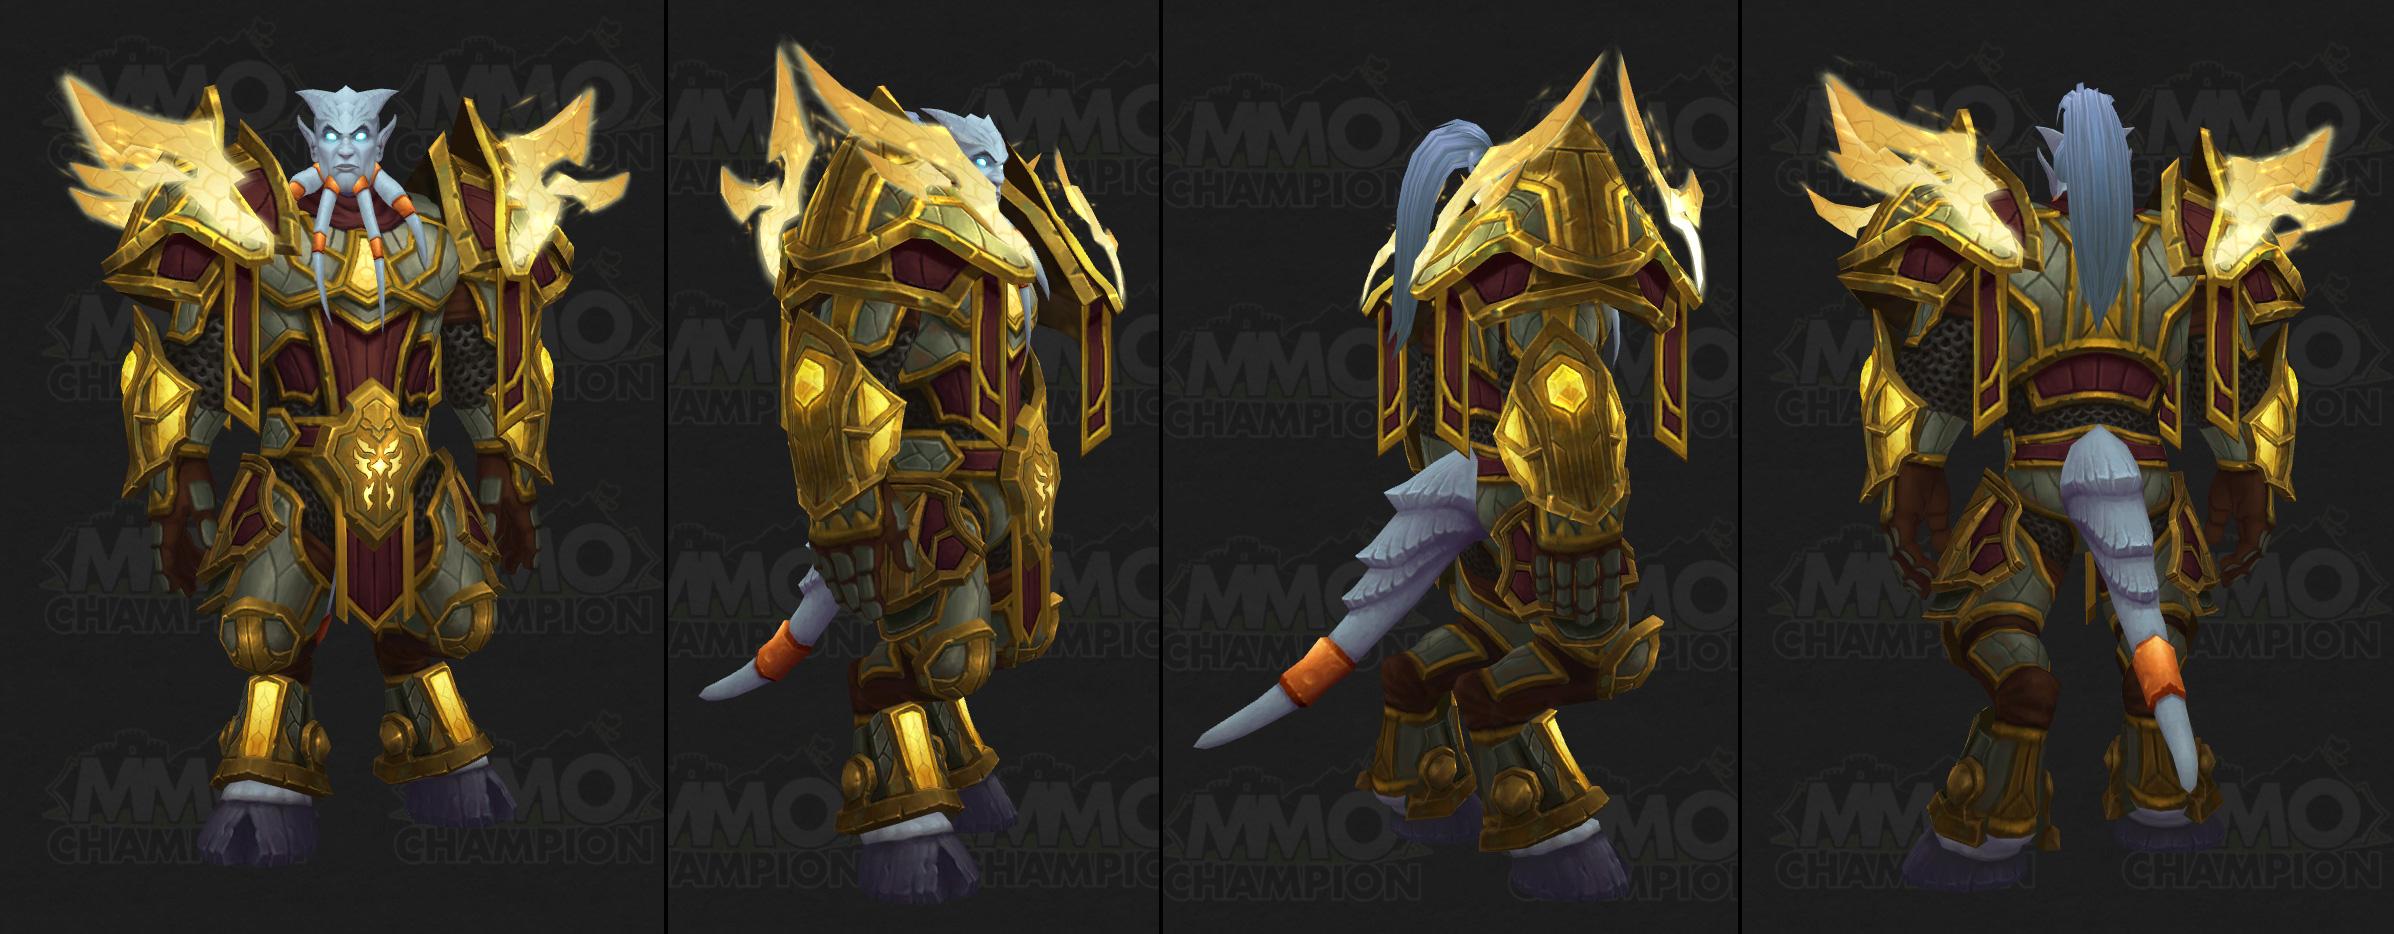 Heritage Armor Hotfix, Wipefest, Warcraft III Event, NA and